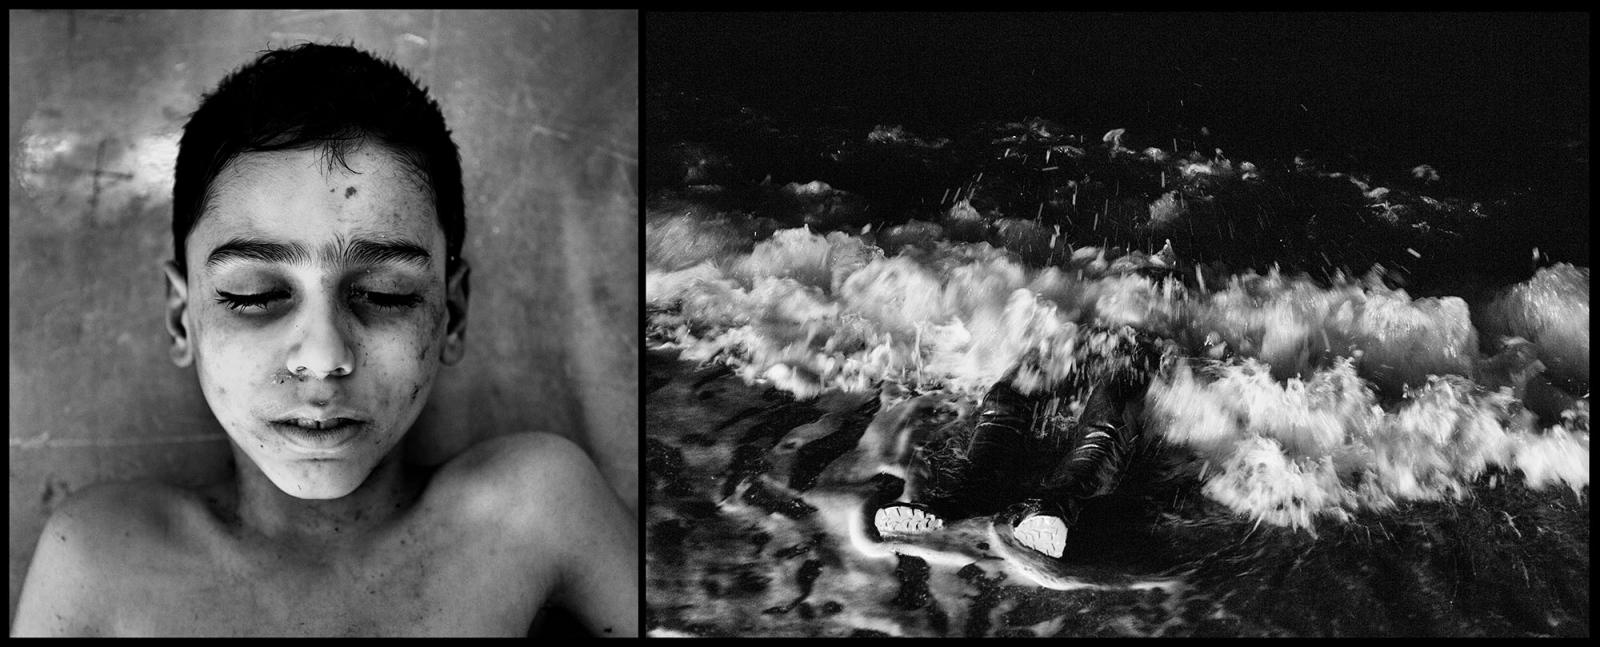 Art and Documentary Photography - Loading Nikos_Pilos_Stern_Goethe_institute_001.jpg